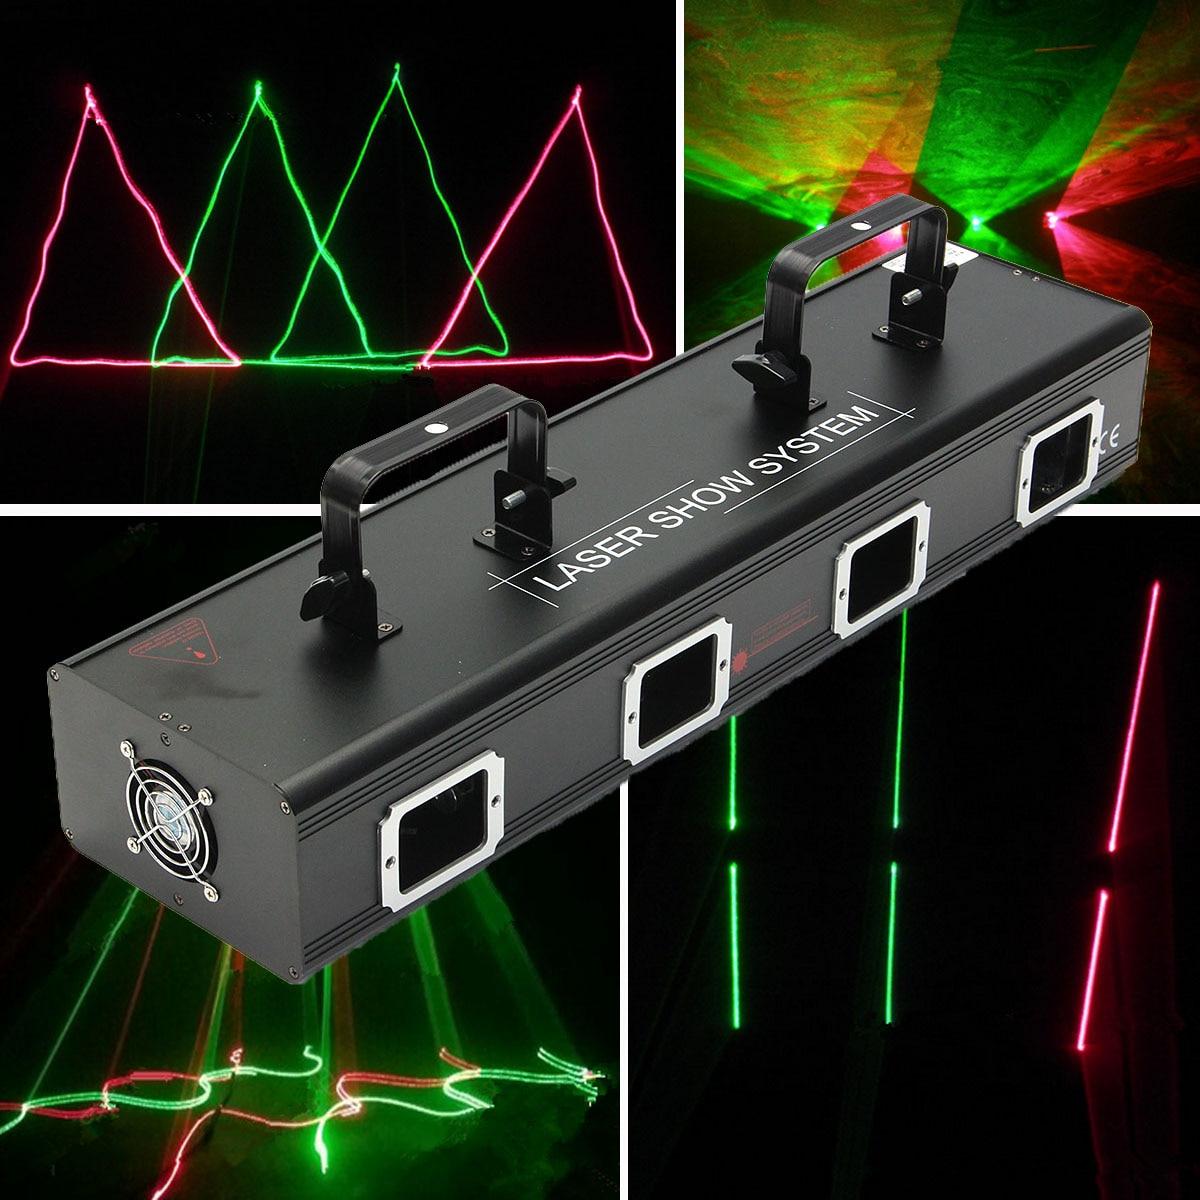 Mising Professional 30W Laser Light Show System 110V Stage Lighting Effect RGB Light Lamp For DJ Stage KTV Club Bar Party Pub